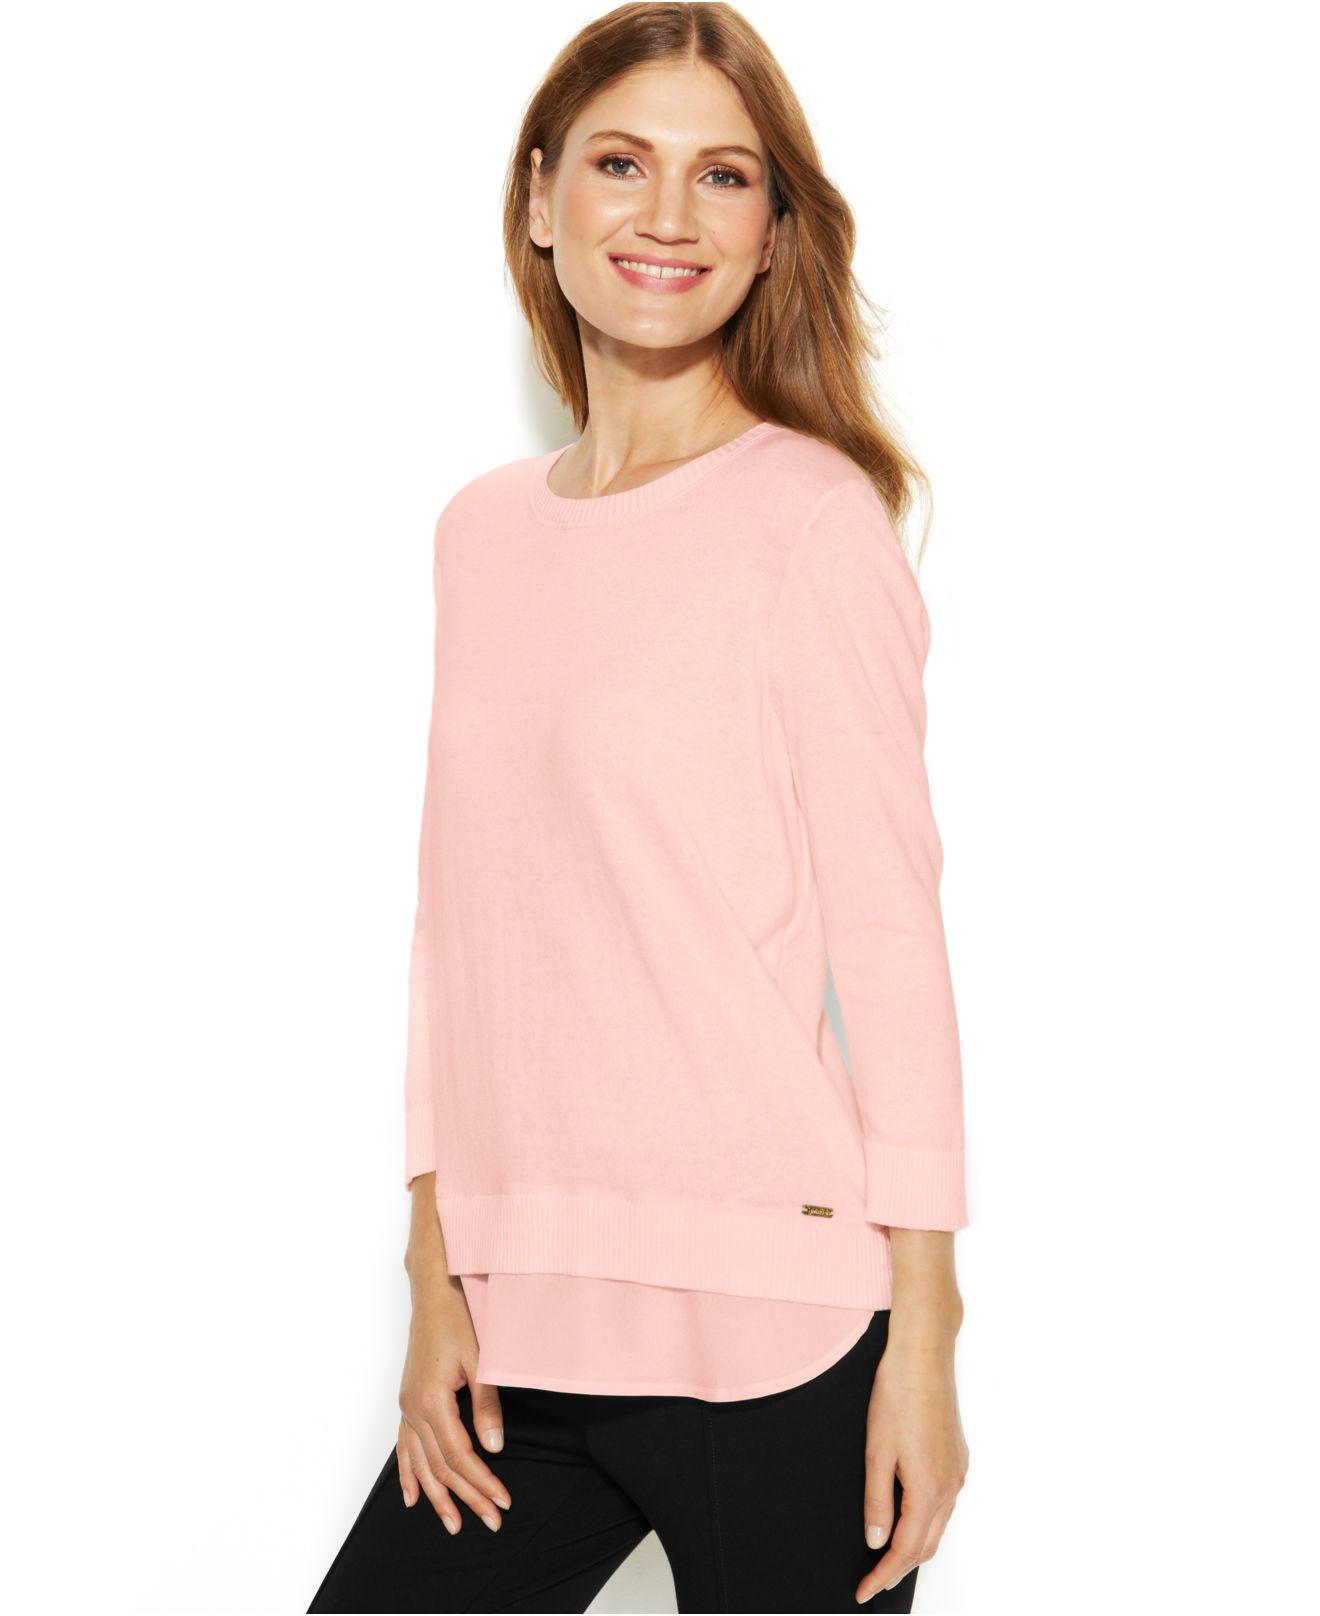 lyst calvin klein split back layered look sweater in pink. Black Bedroom Furniture Sets. Home Design Ideas